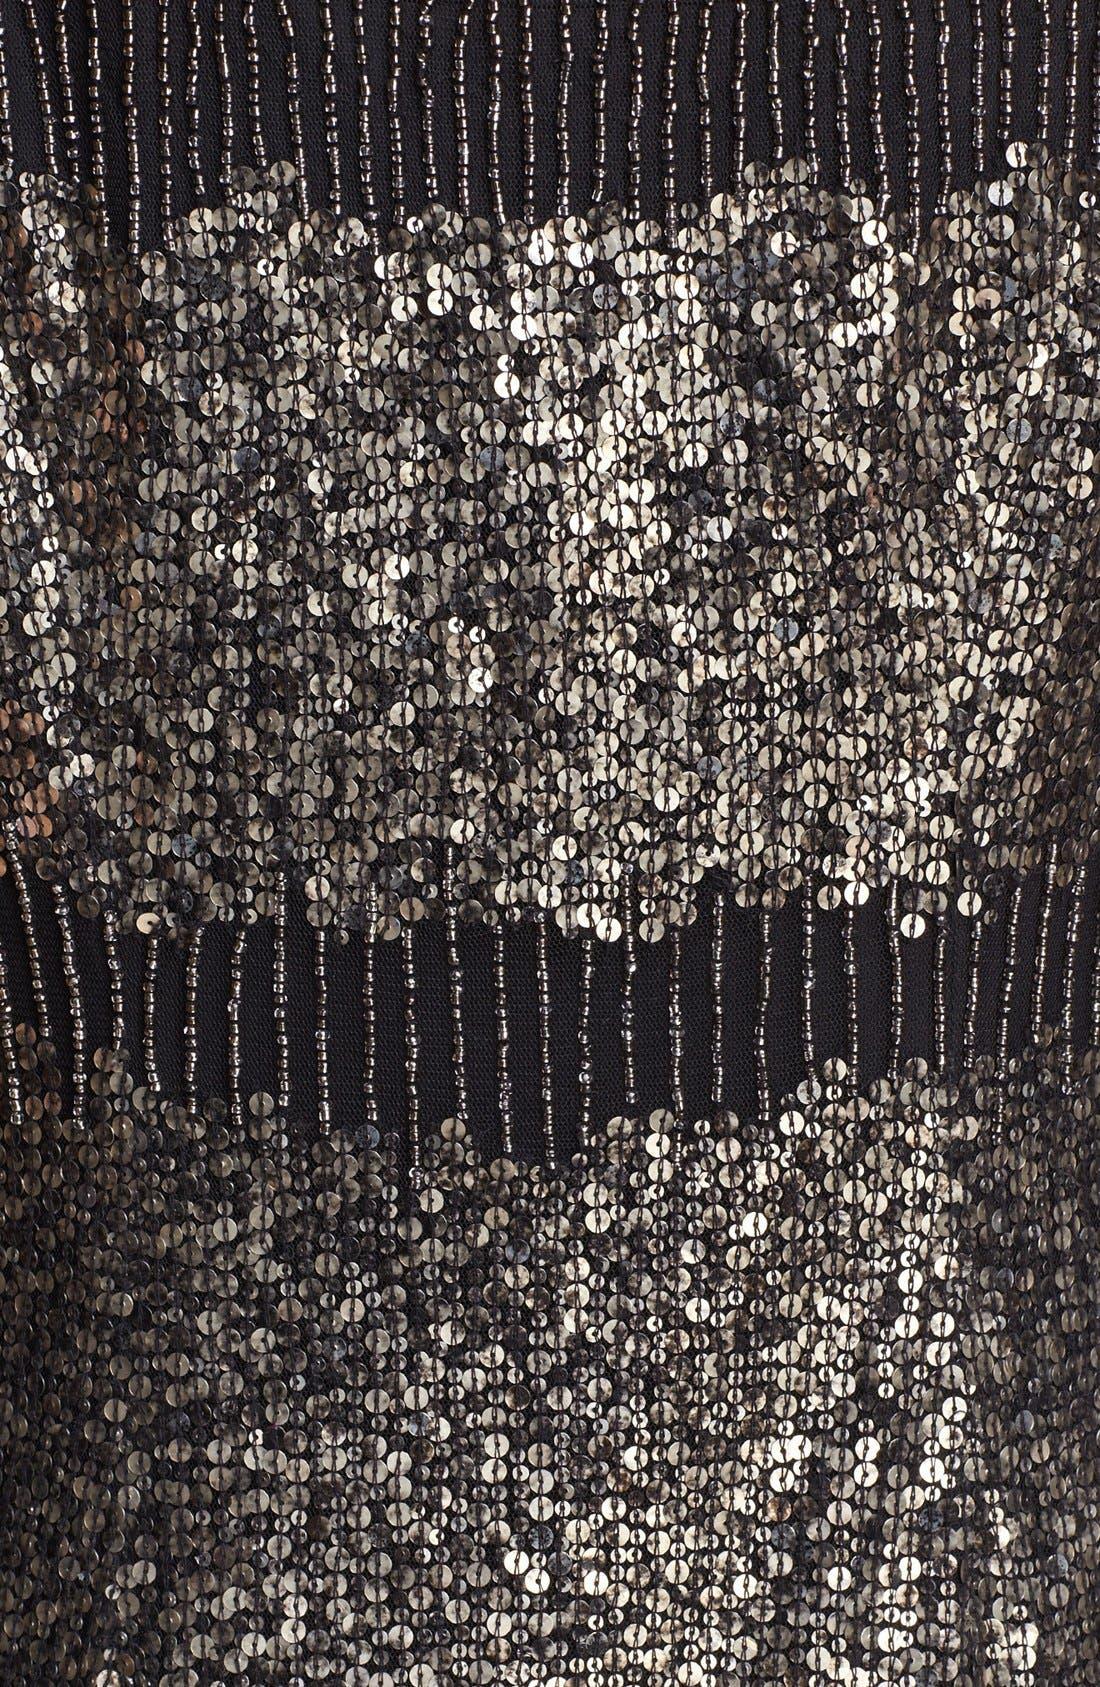 ADRIANNA PAPELL, Illusion Yoke Beaded Sheath Dress, Alternate thumbnail 2, color, 001